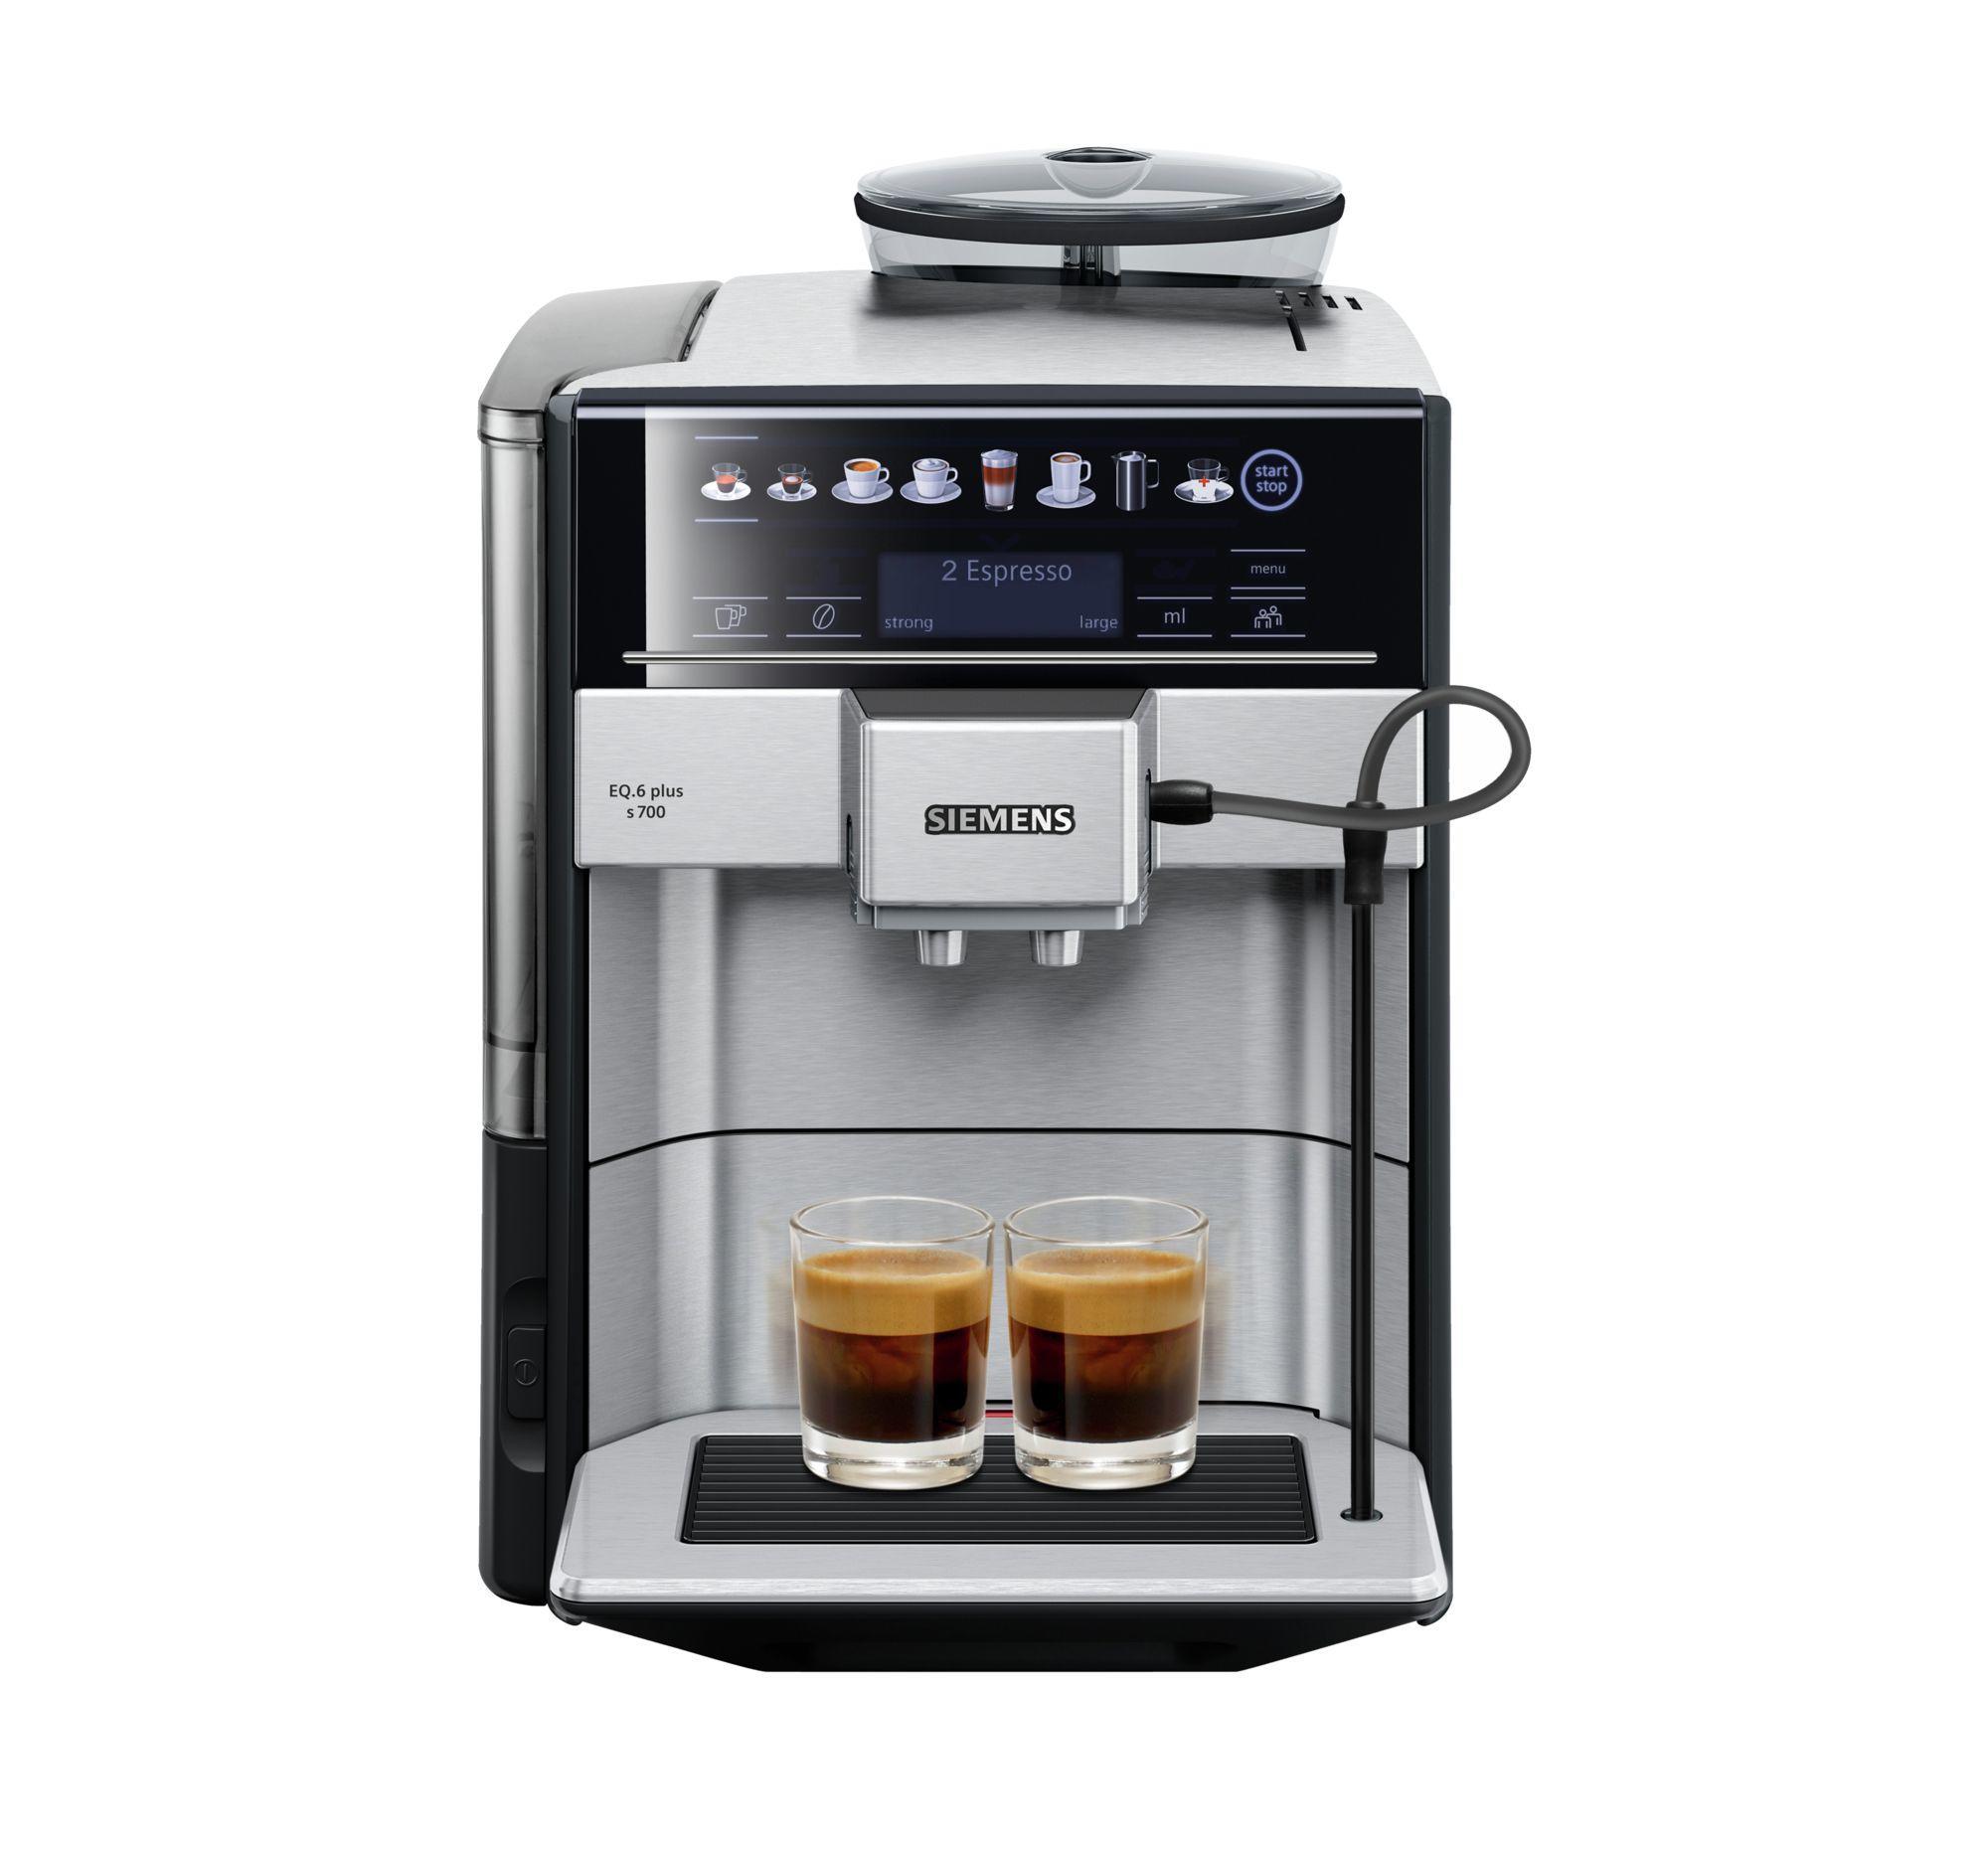 Image of TE657313RW EQ.6 s700 Fully Automatic Coffee Machine